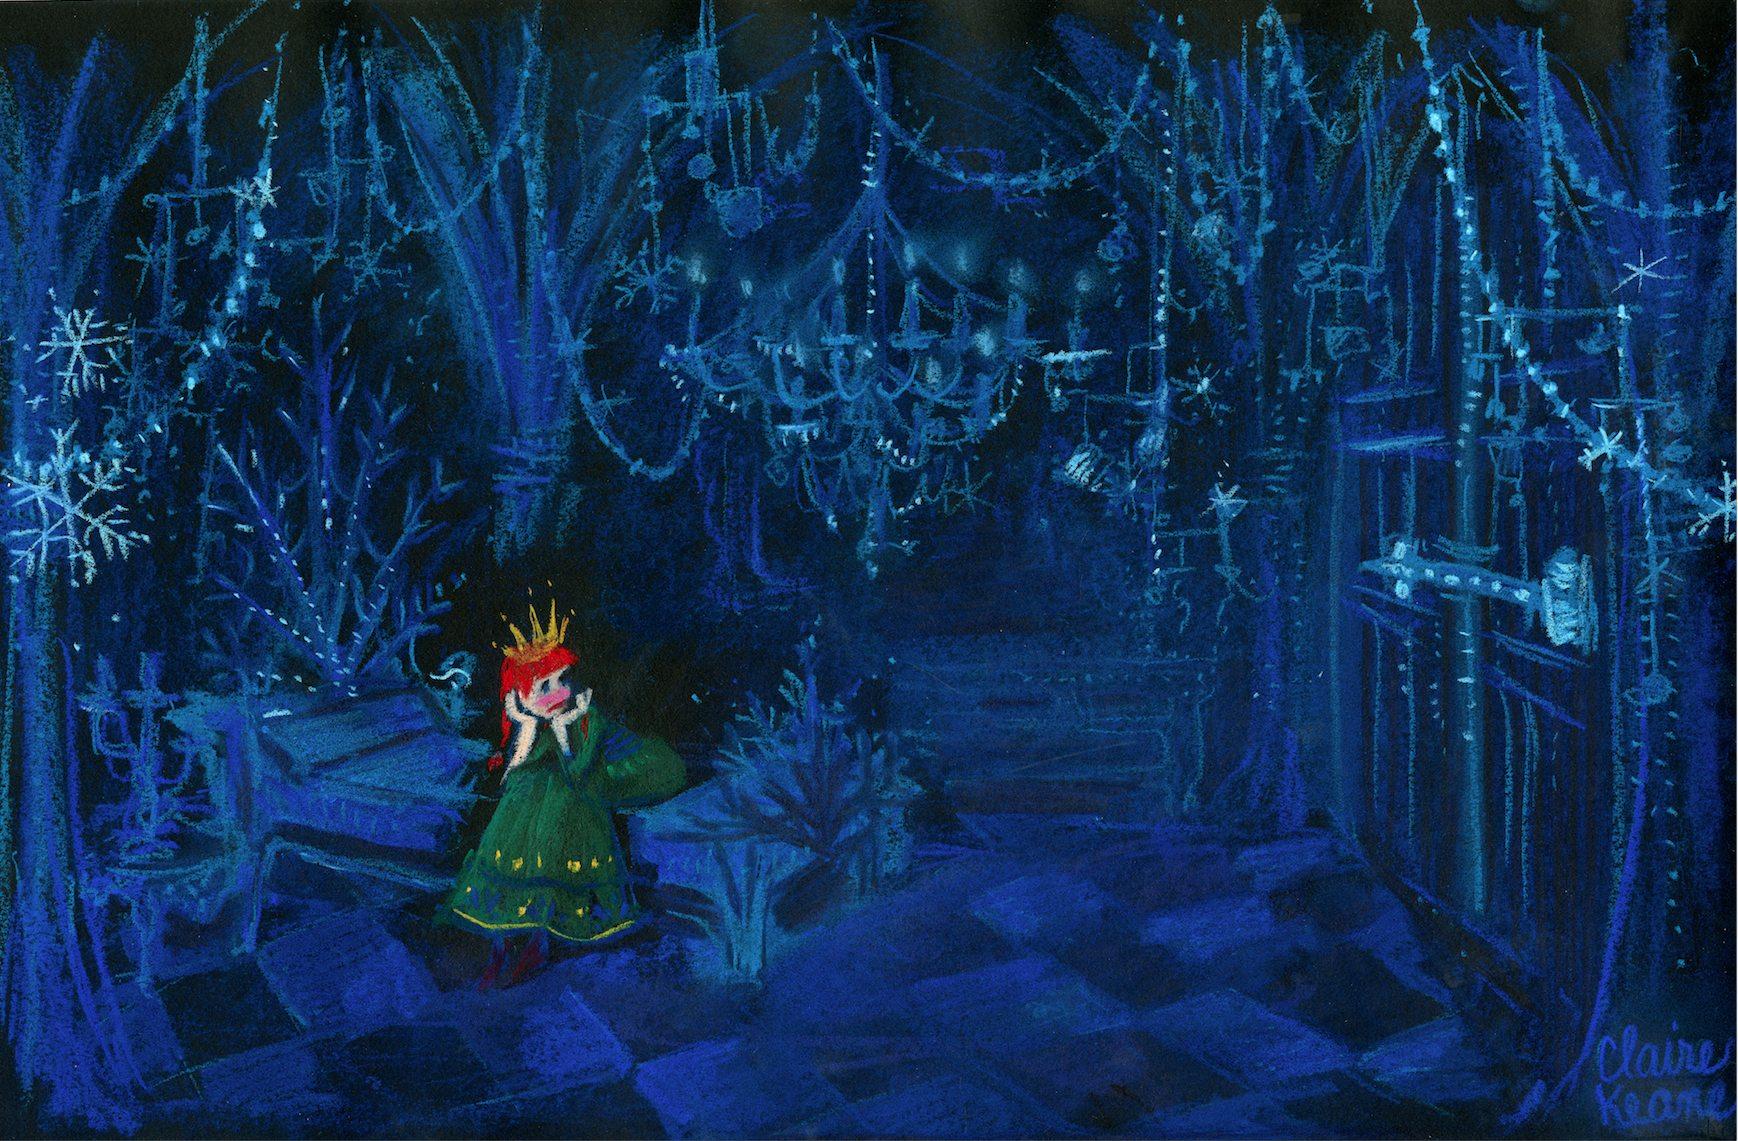 Anna locked in her room/prison in Elsa's ice castle // visual development for #Frozen https://t.co/J0fOVOnD1H